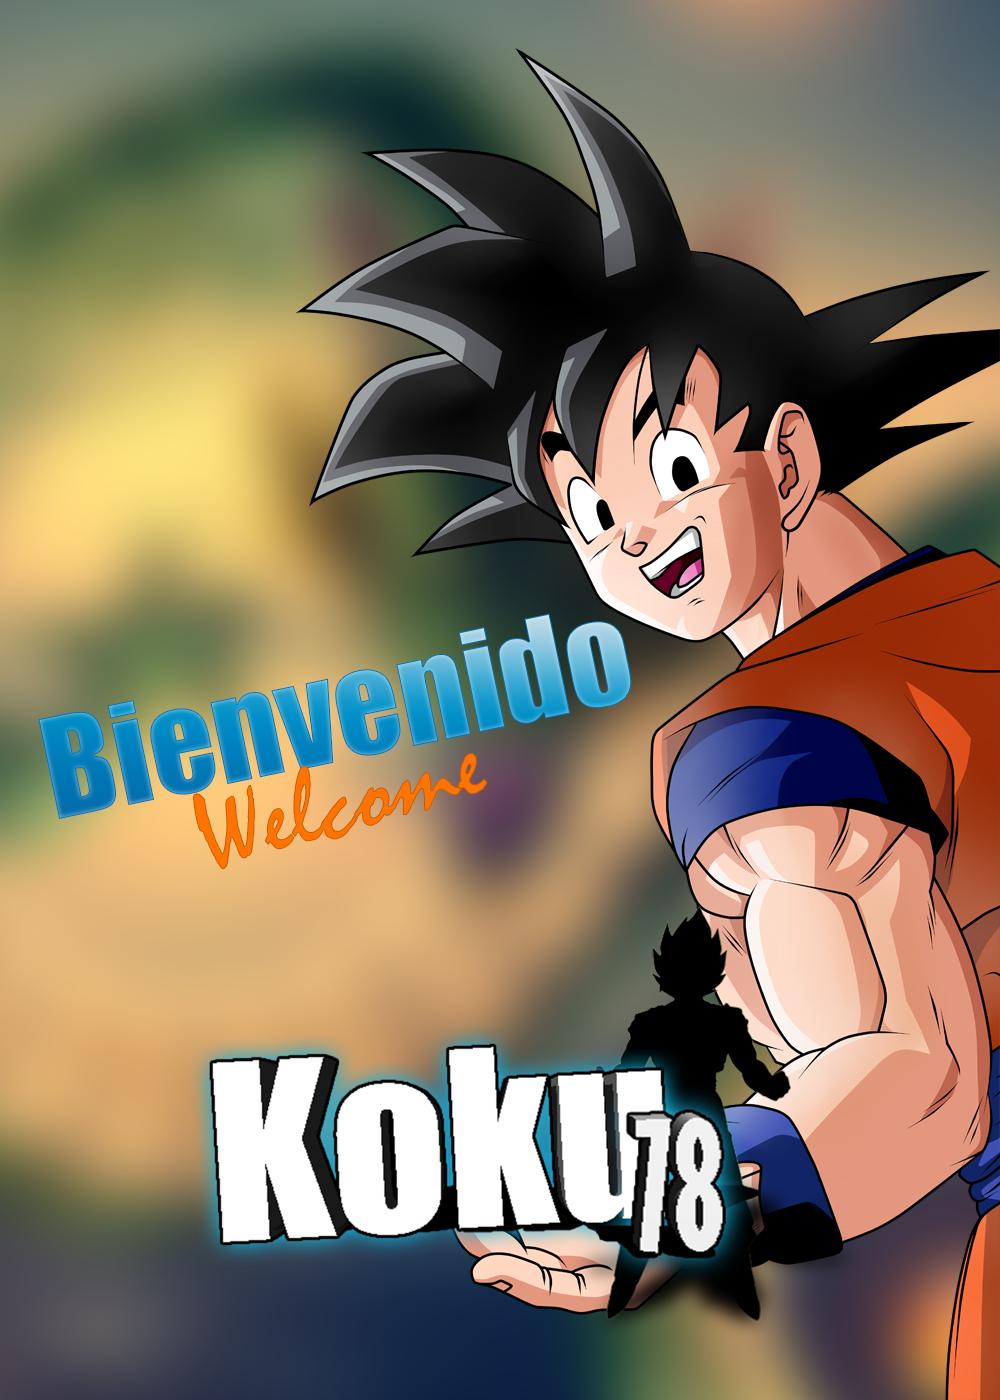 Koku78's Profile Picture